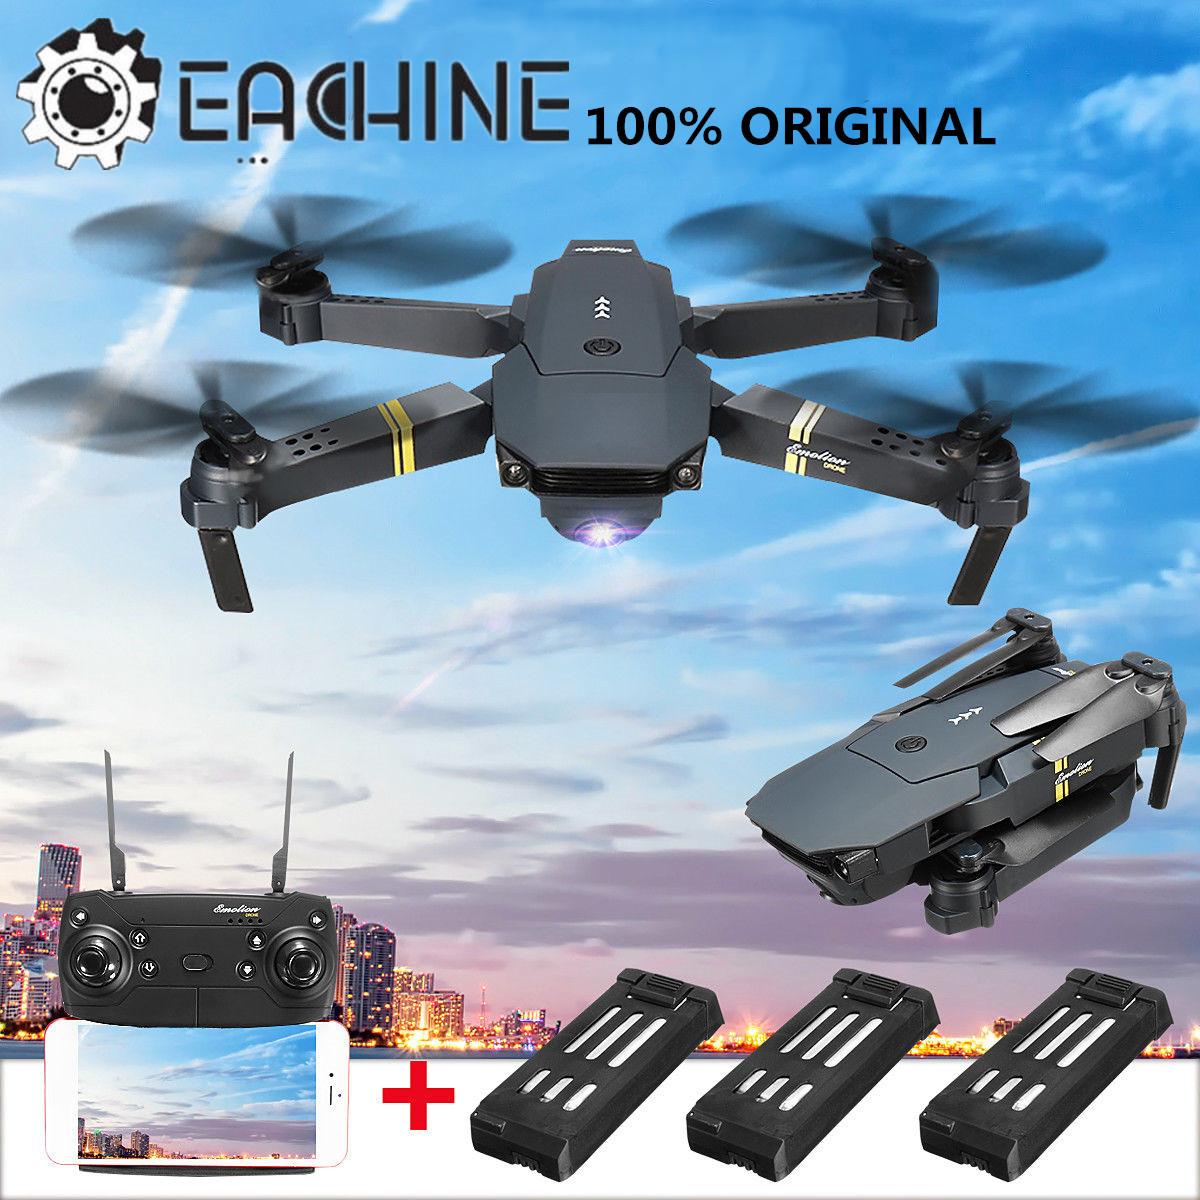 Eachine E58 WIFI FPV  Foldable Arm Drone Quadcopter High Hold Mode, Headless Mode ,0.3MP/2MP HD Camera